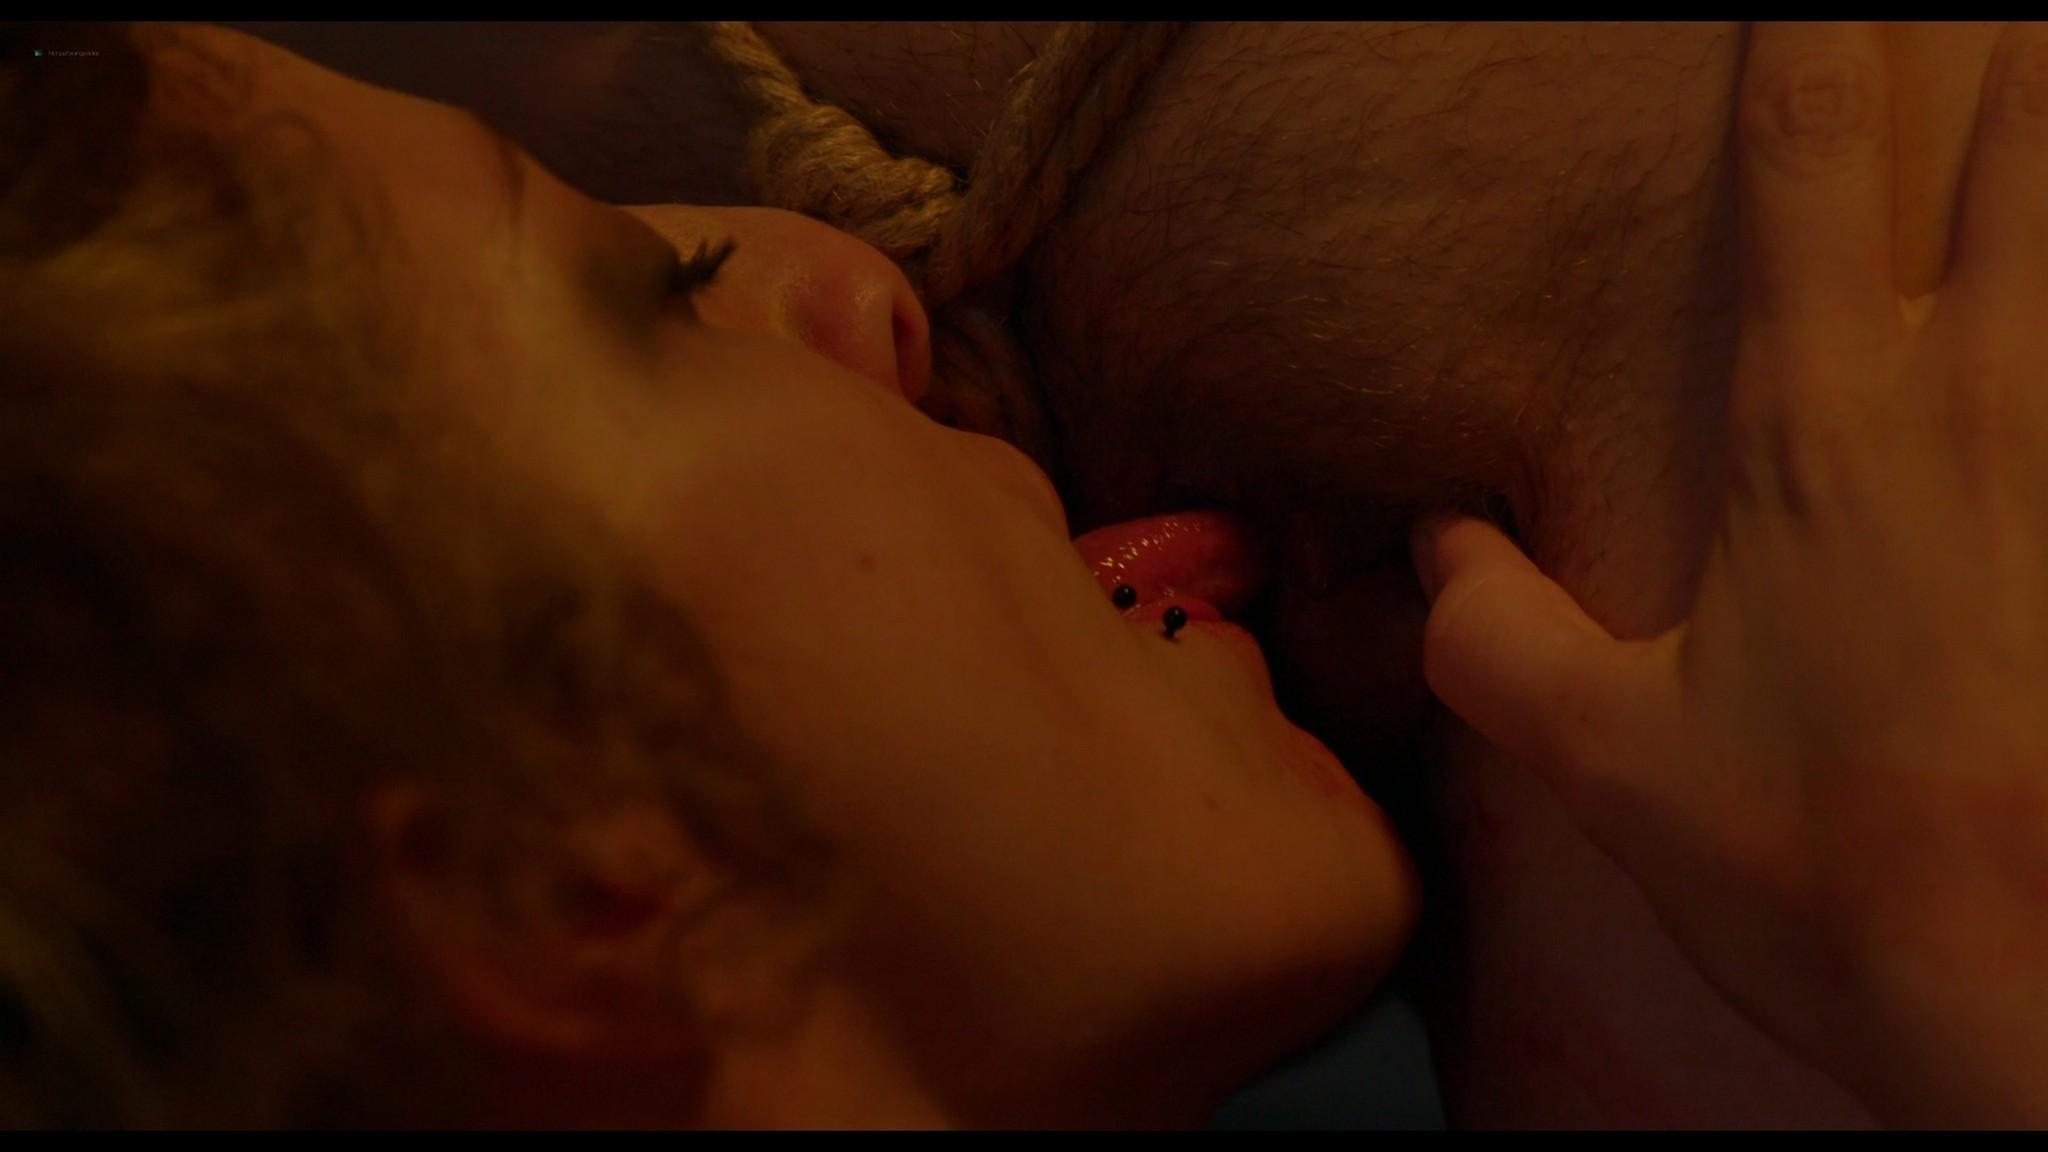 Sofia Gala Castiglione nude explicit Erica Rivas and others nude explicit lesbian sex The Daughters of Fire 2018 1080p Web 17